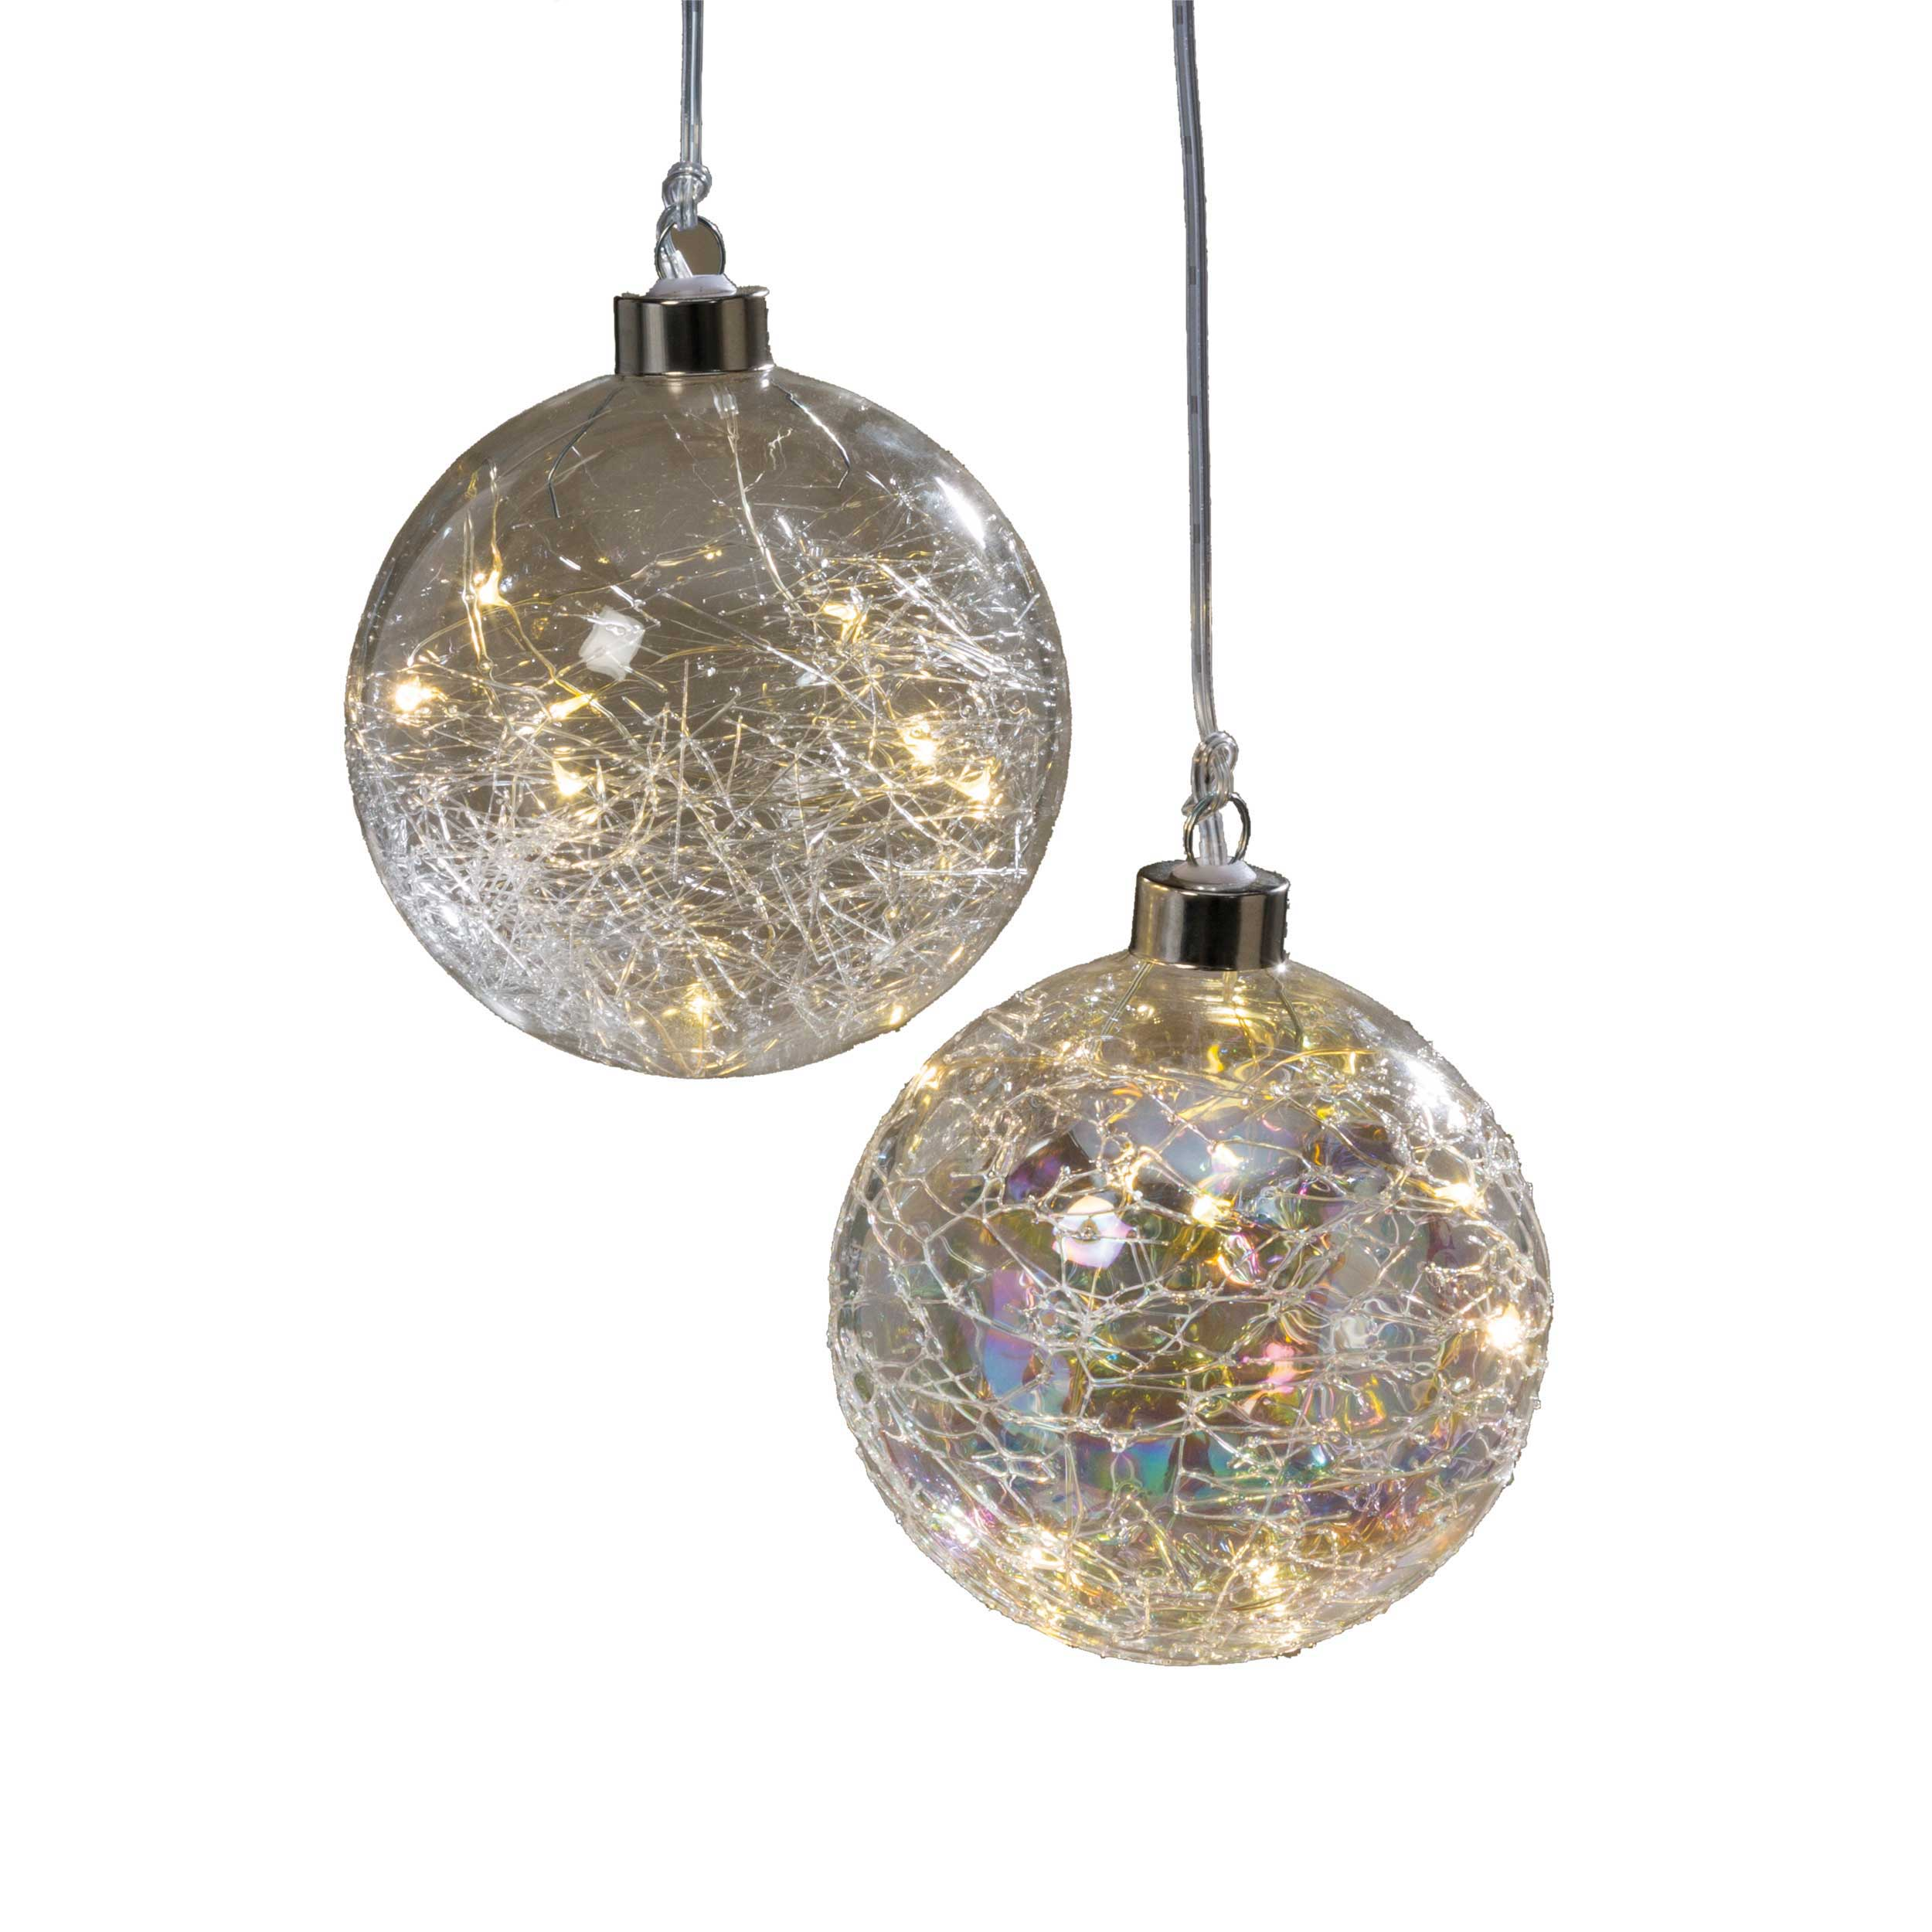 LED Weihnachtskugel 10cm JILIA